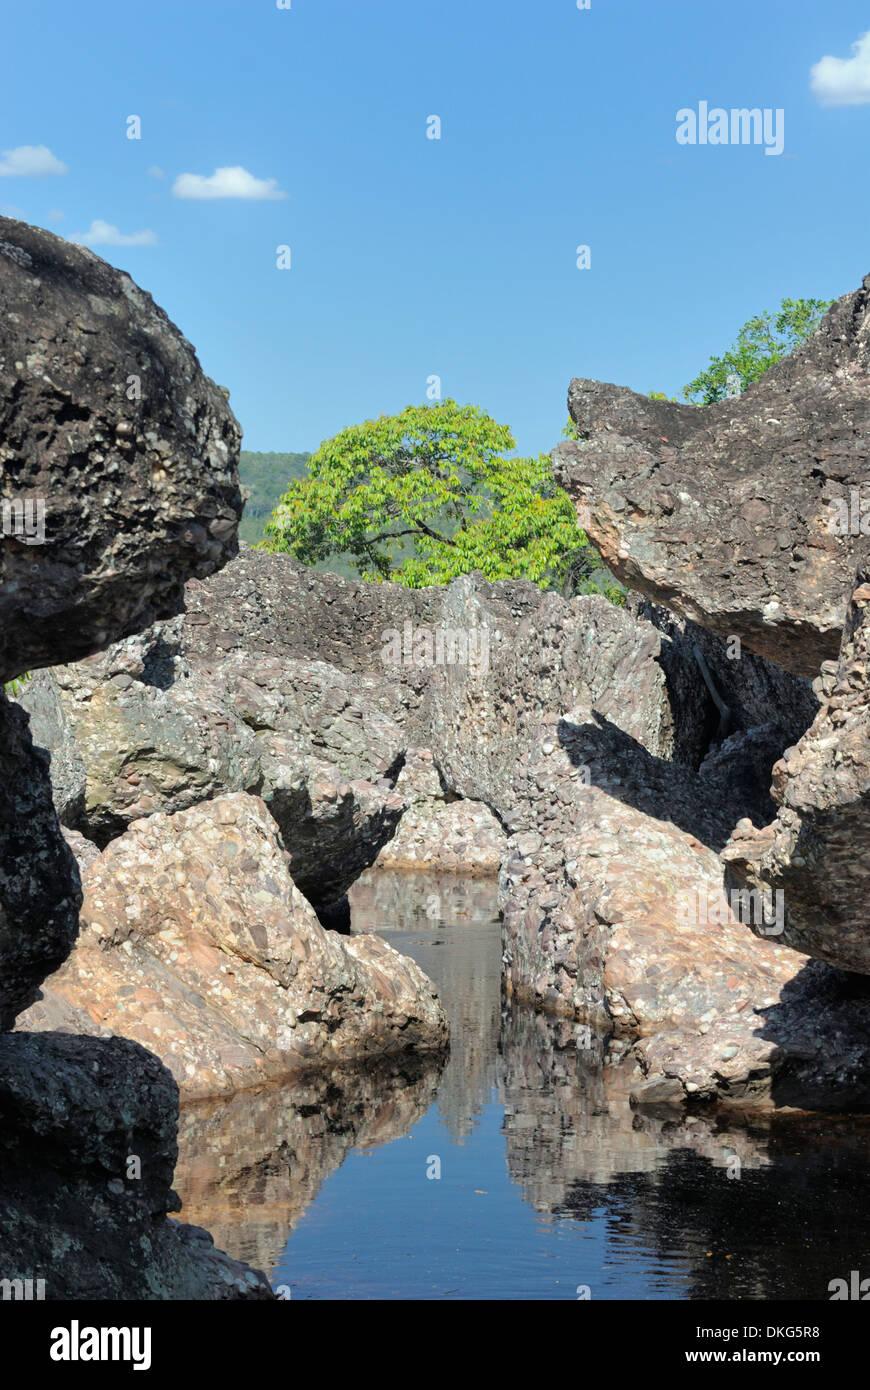 Parque Nacional de Chapada Diamantina, Lencois, Bahia, Brazil: Rio Lencois. - Stock Image